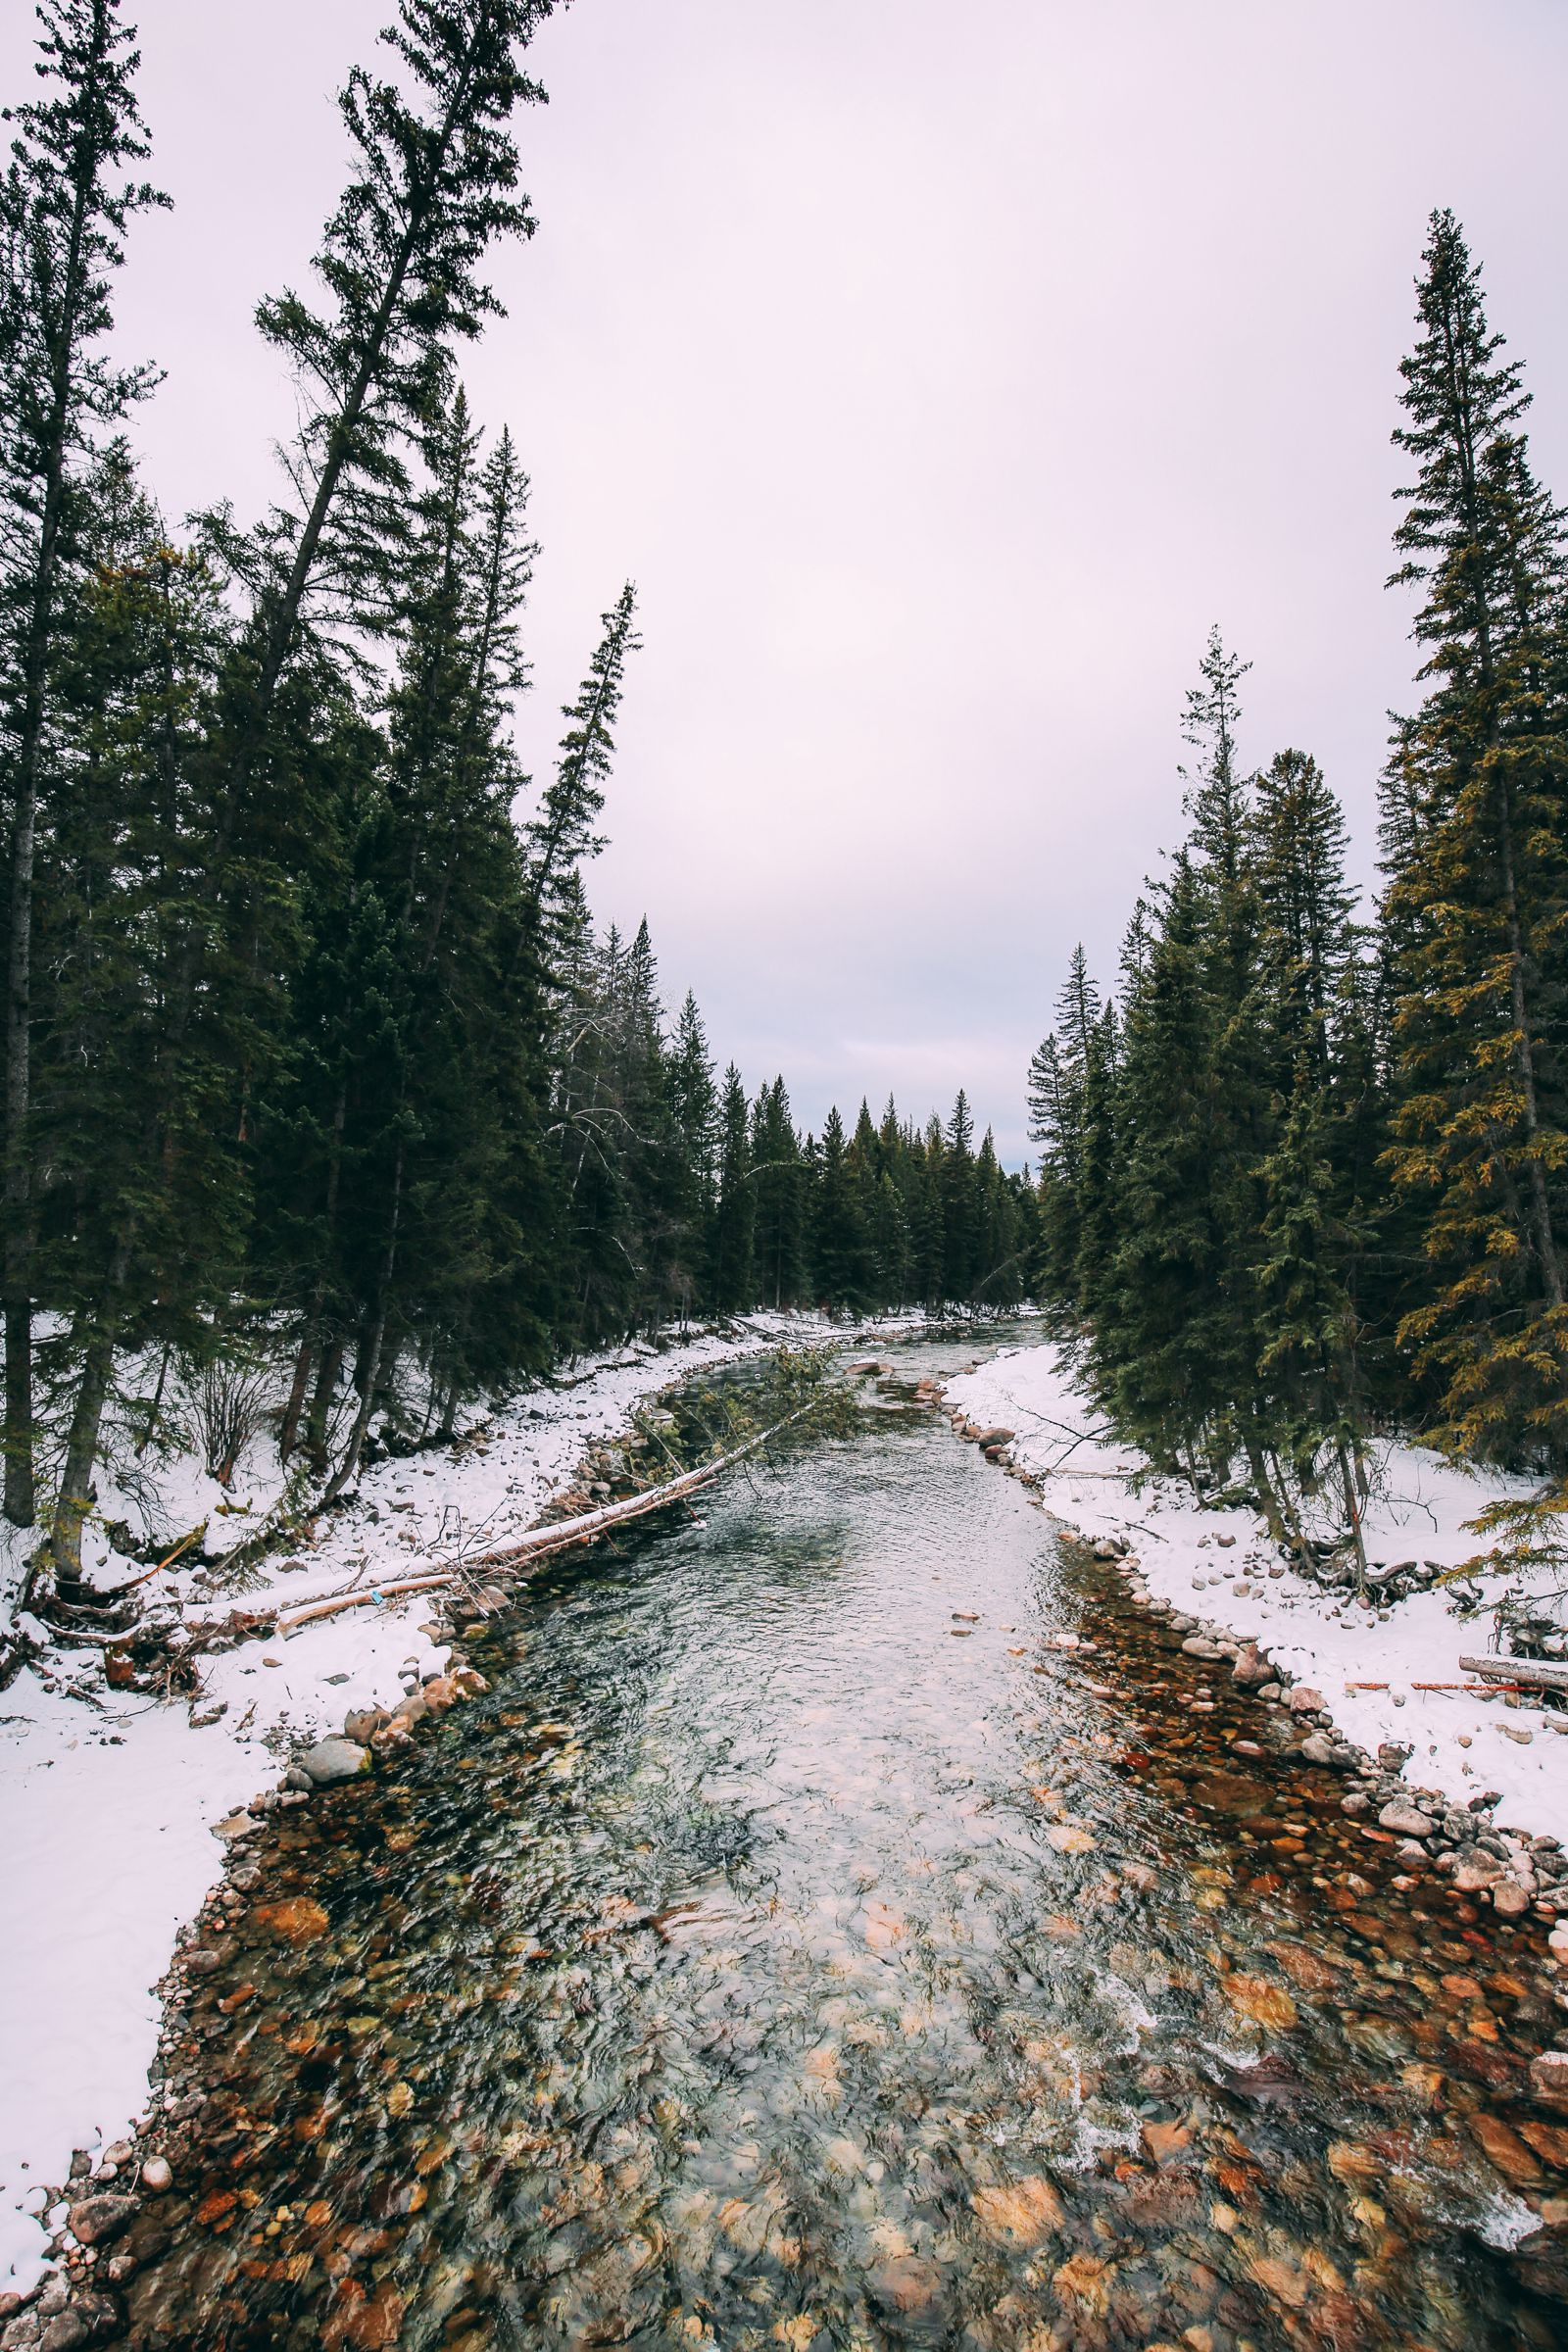 The Most Beautiful Place In Jasper (Canada) You've Never Heard Of! (1)